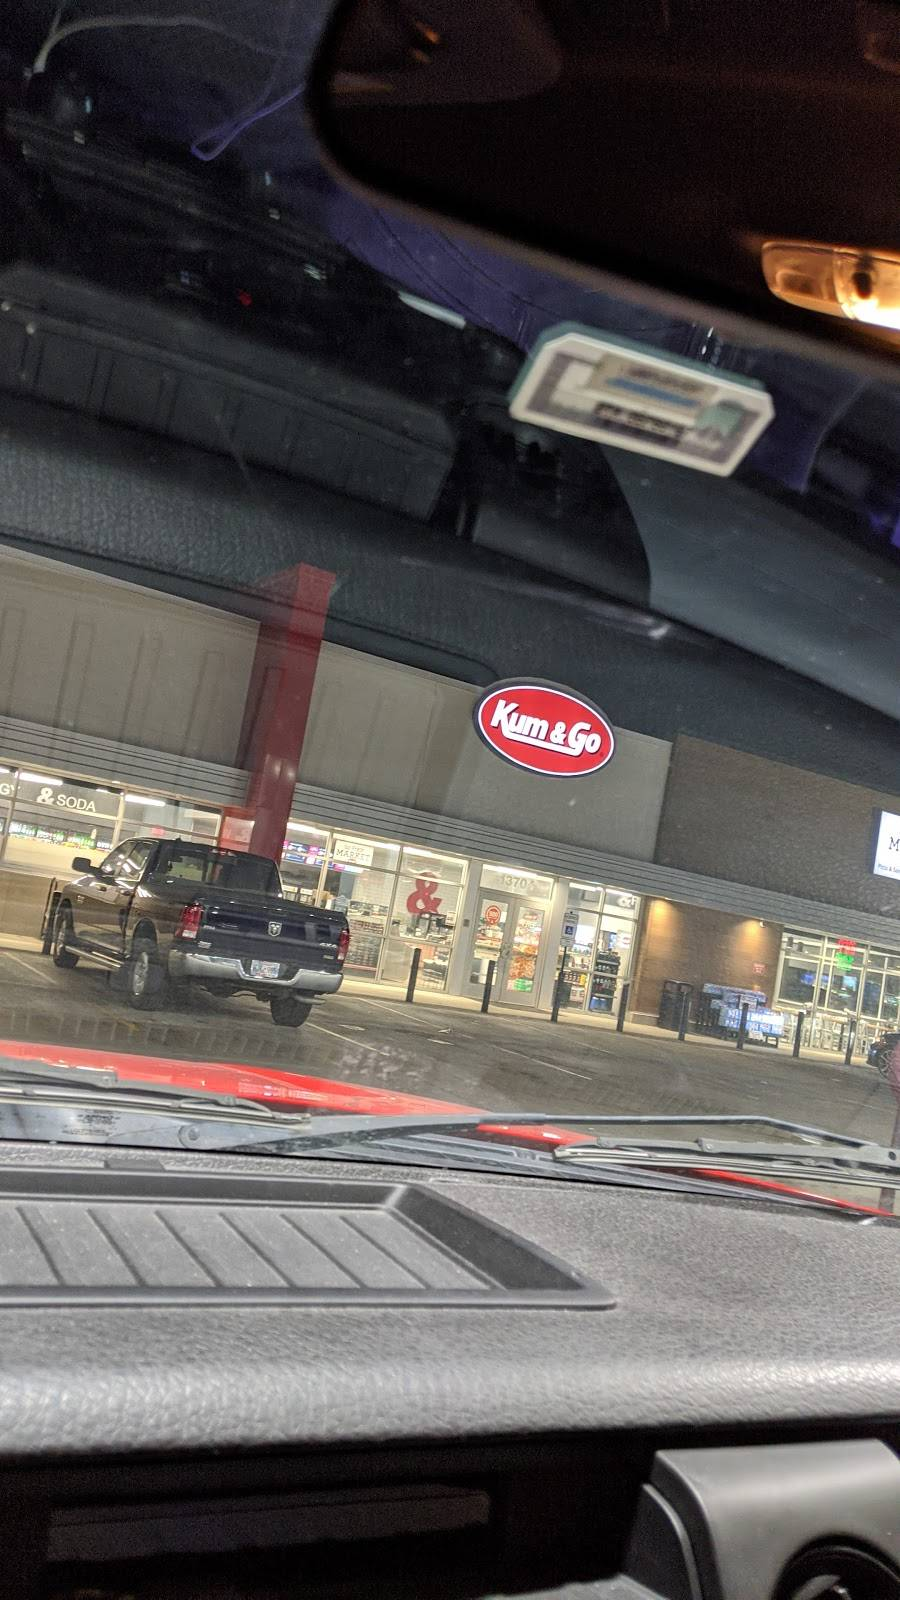 Kum & Go - convenience store  | Photo 4 of 8 | Address: 13704 E 106th St N, Owasso, OK 74055, USA | Phone: (918) 272-8661